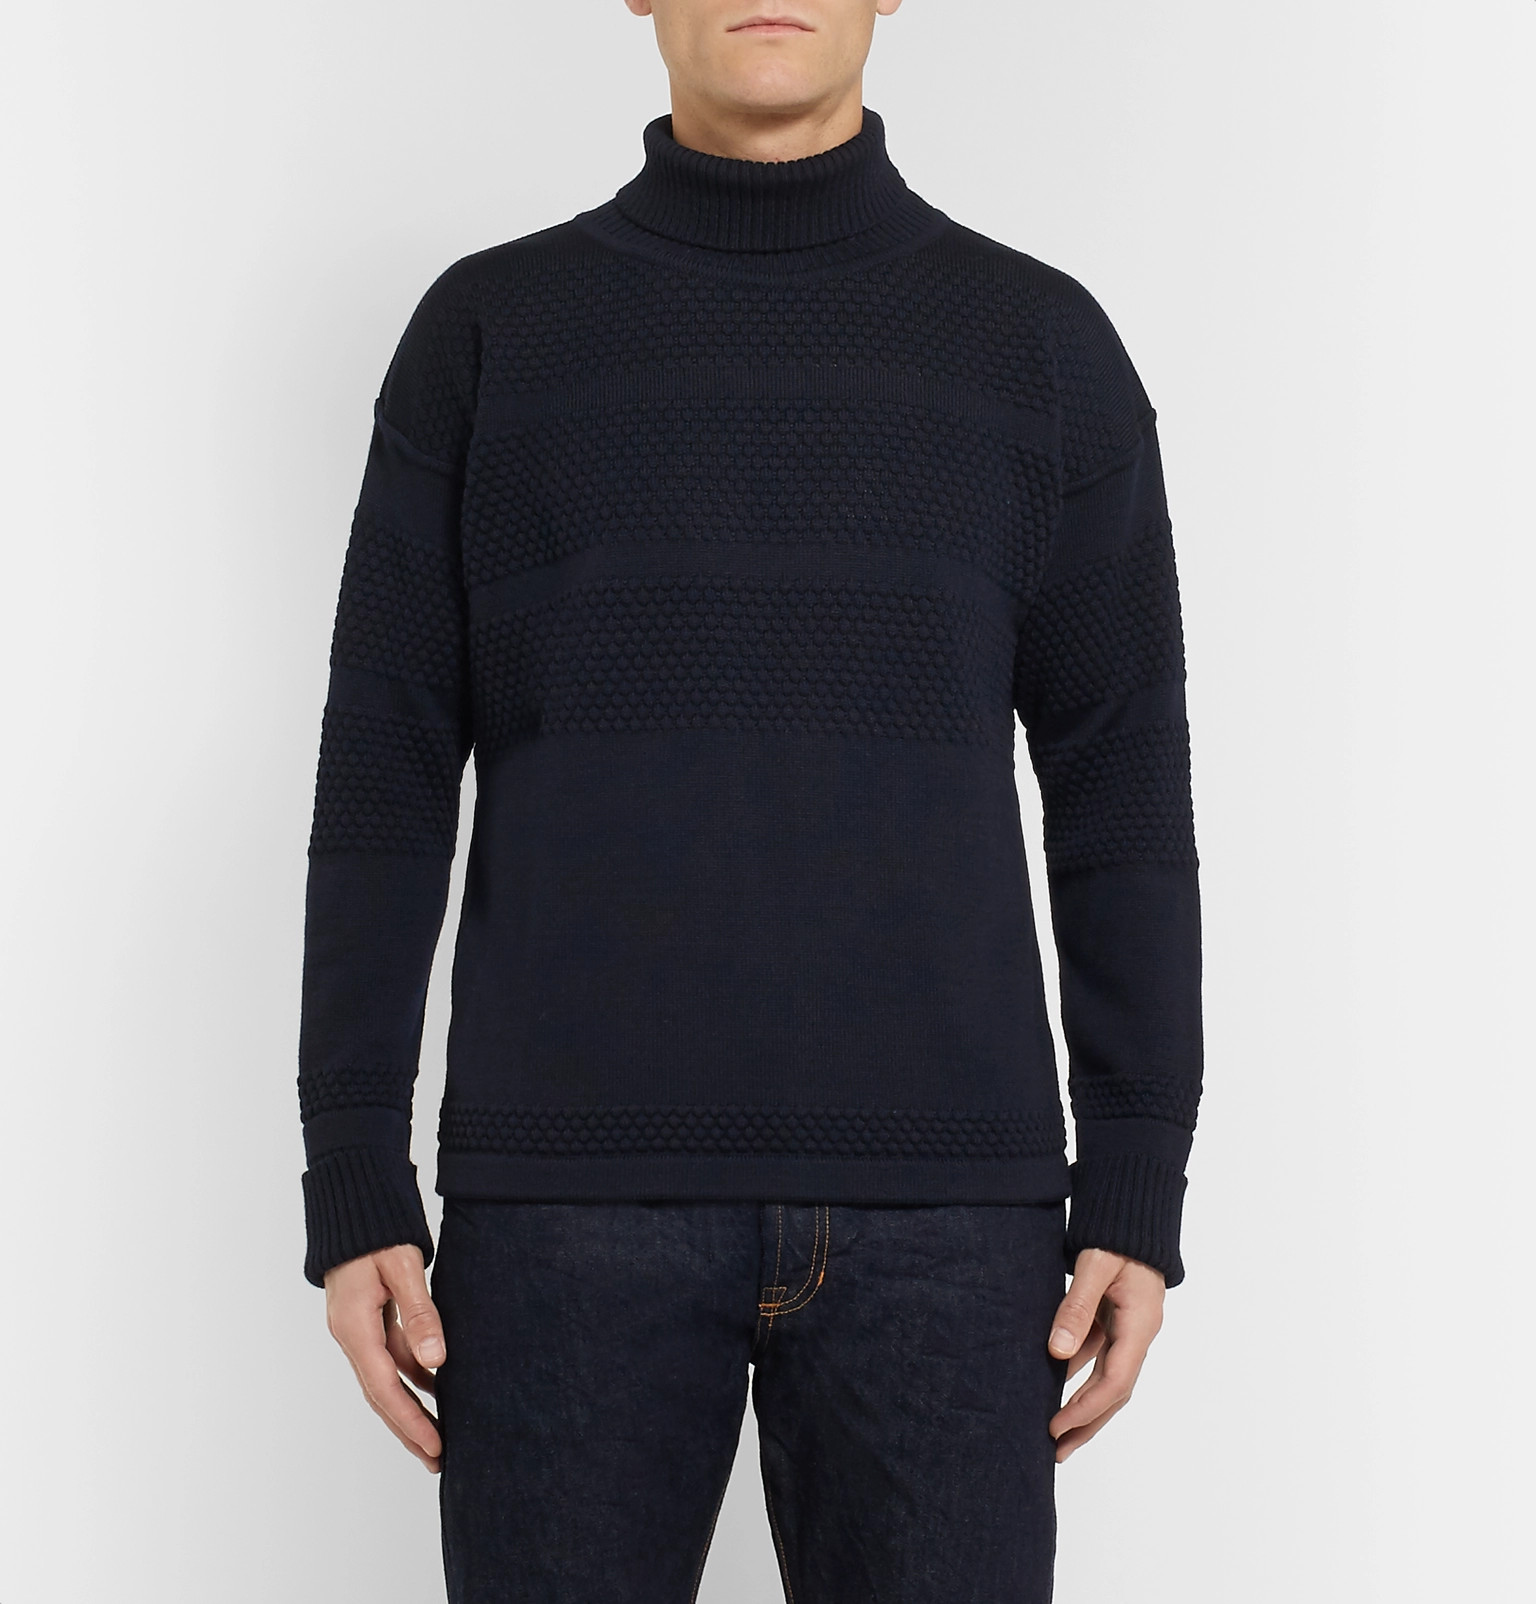 Mr Merino Sweater Rollneck Wool P Navy x0BqaSwP